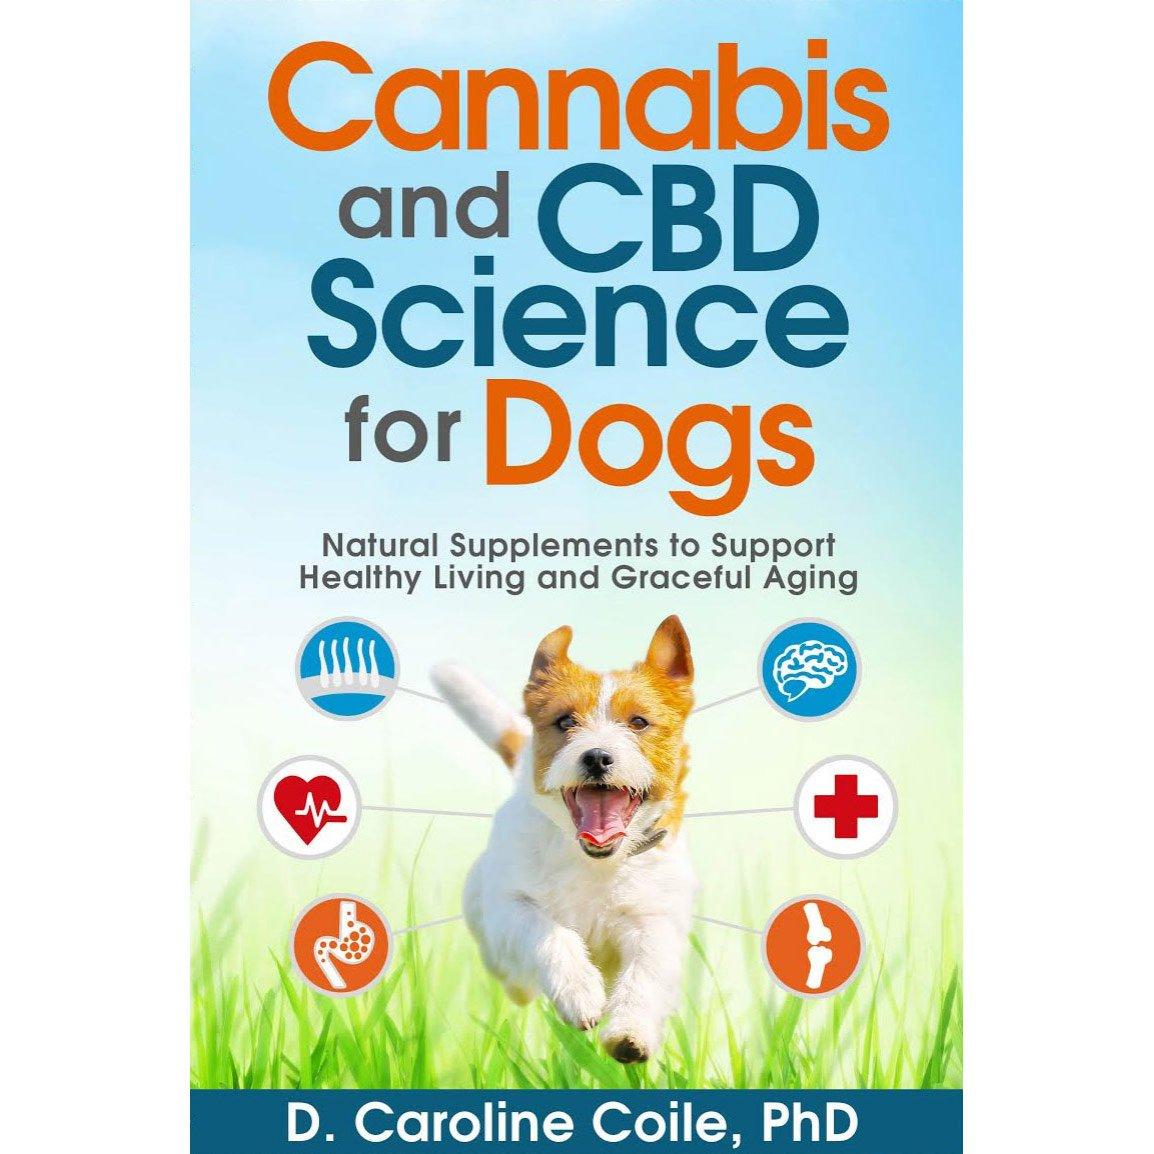 Top 6 Cannabis Grow Books